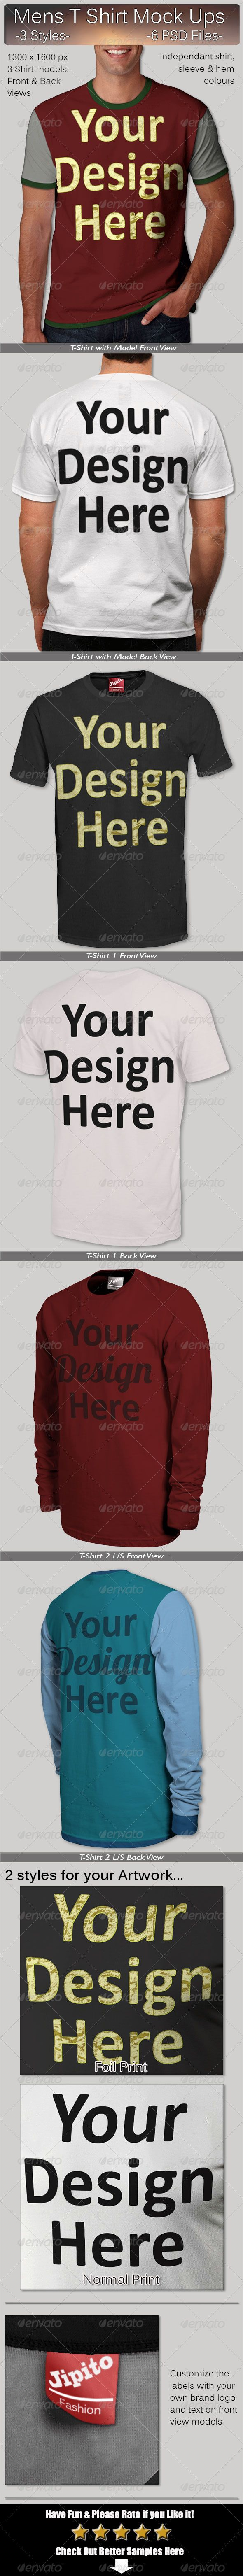 Pin by Bashooka Web & Graphic Design on T shirt Mockup Template